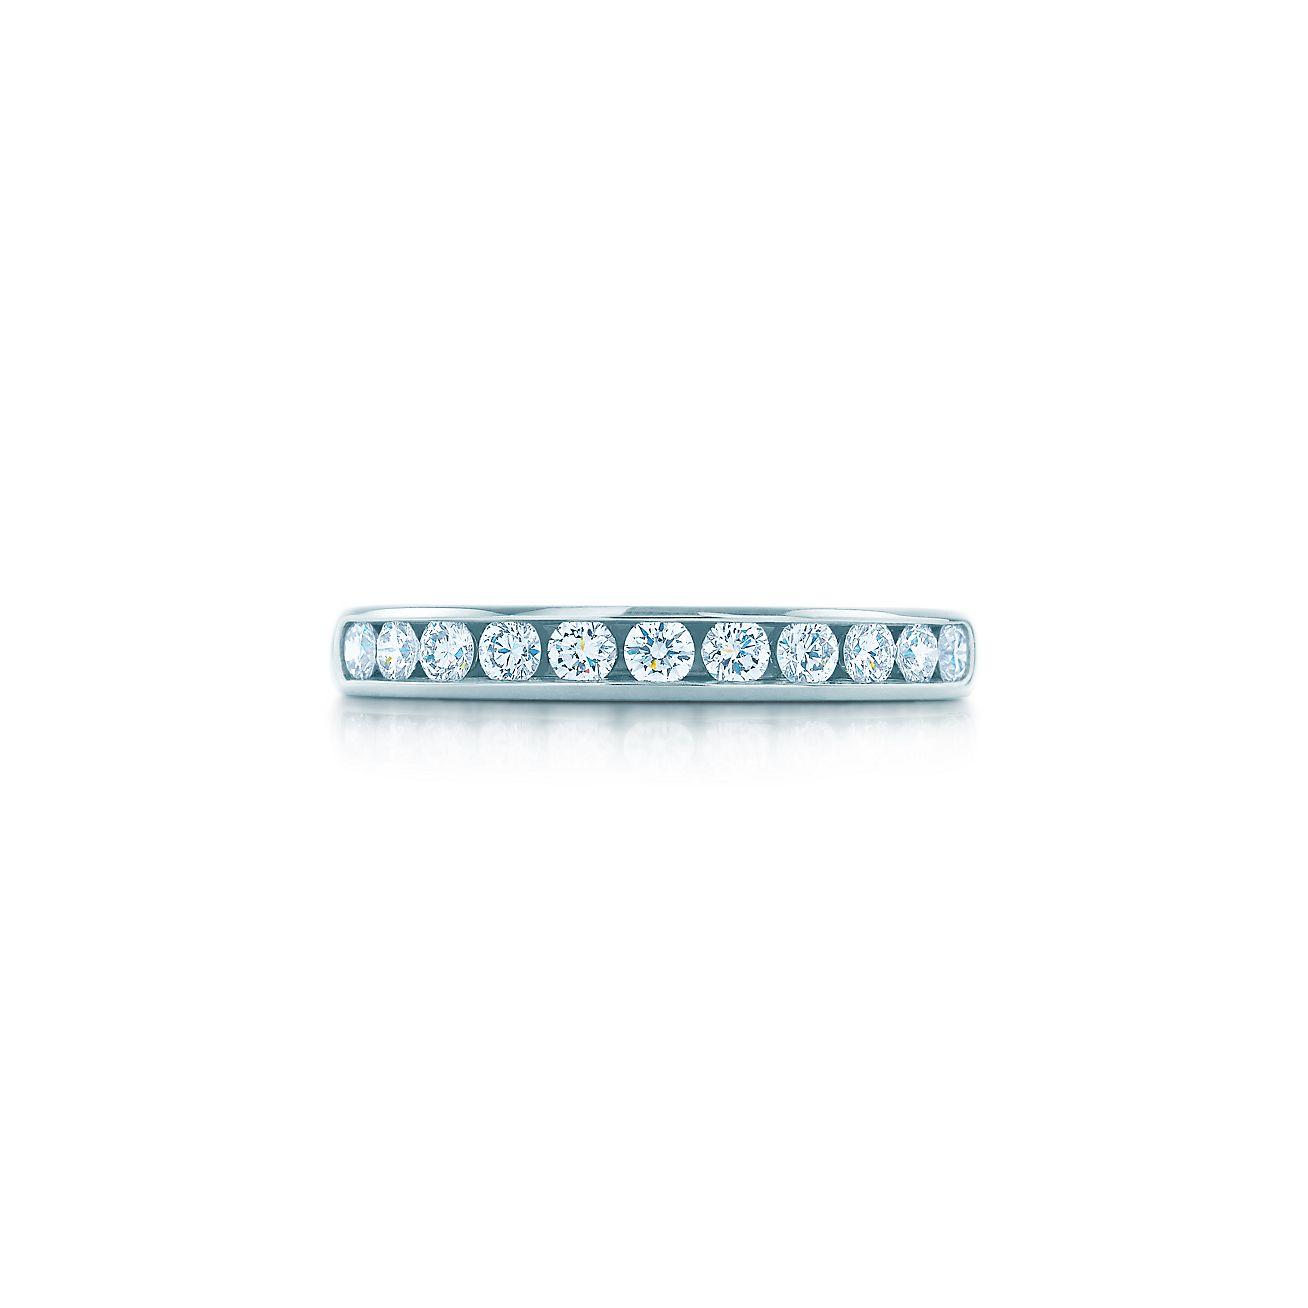 Tiffany diamond wedding band in platinum 3 mm wide tiffany co tiffany diamond wedding band junglespirit Images